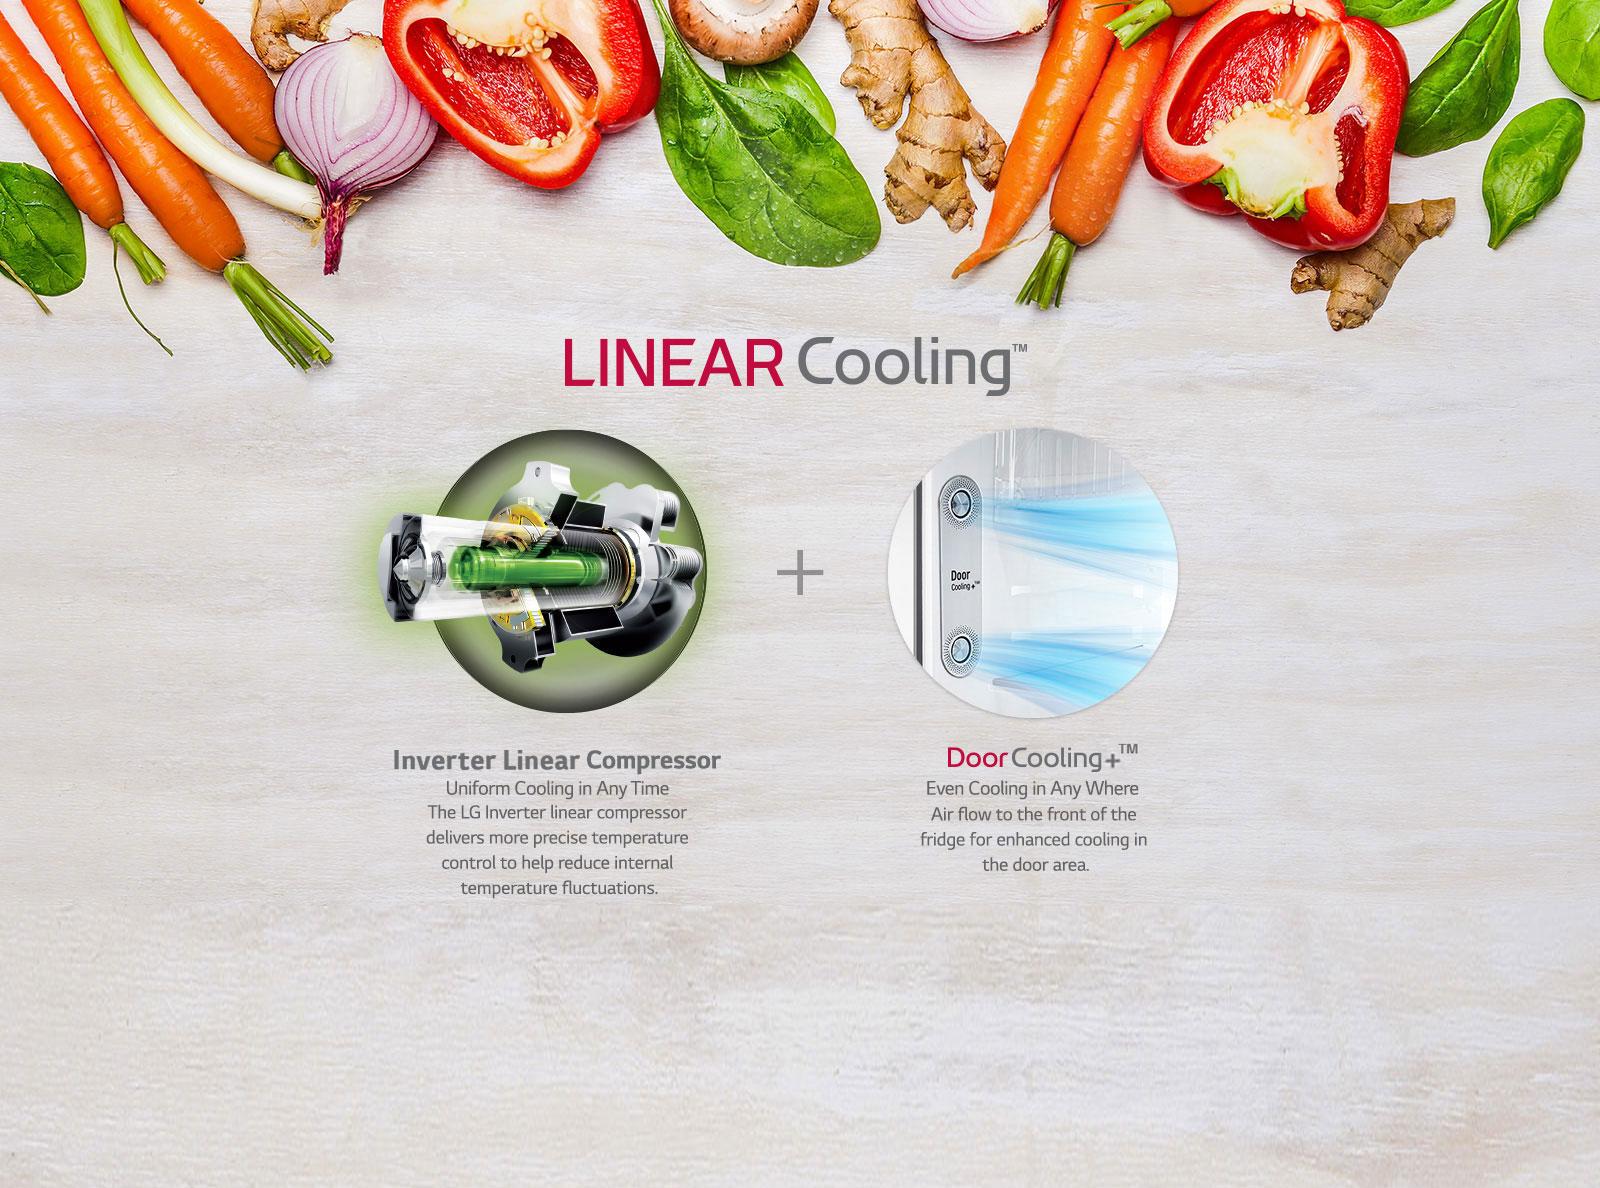 LG GL-T302RPZ3 284 Ltr Linear Cooling